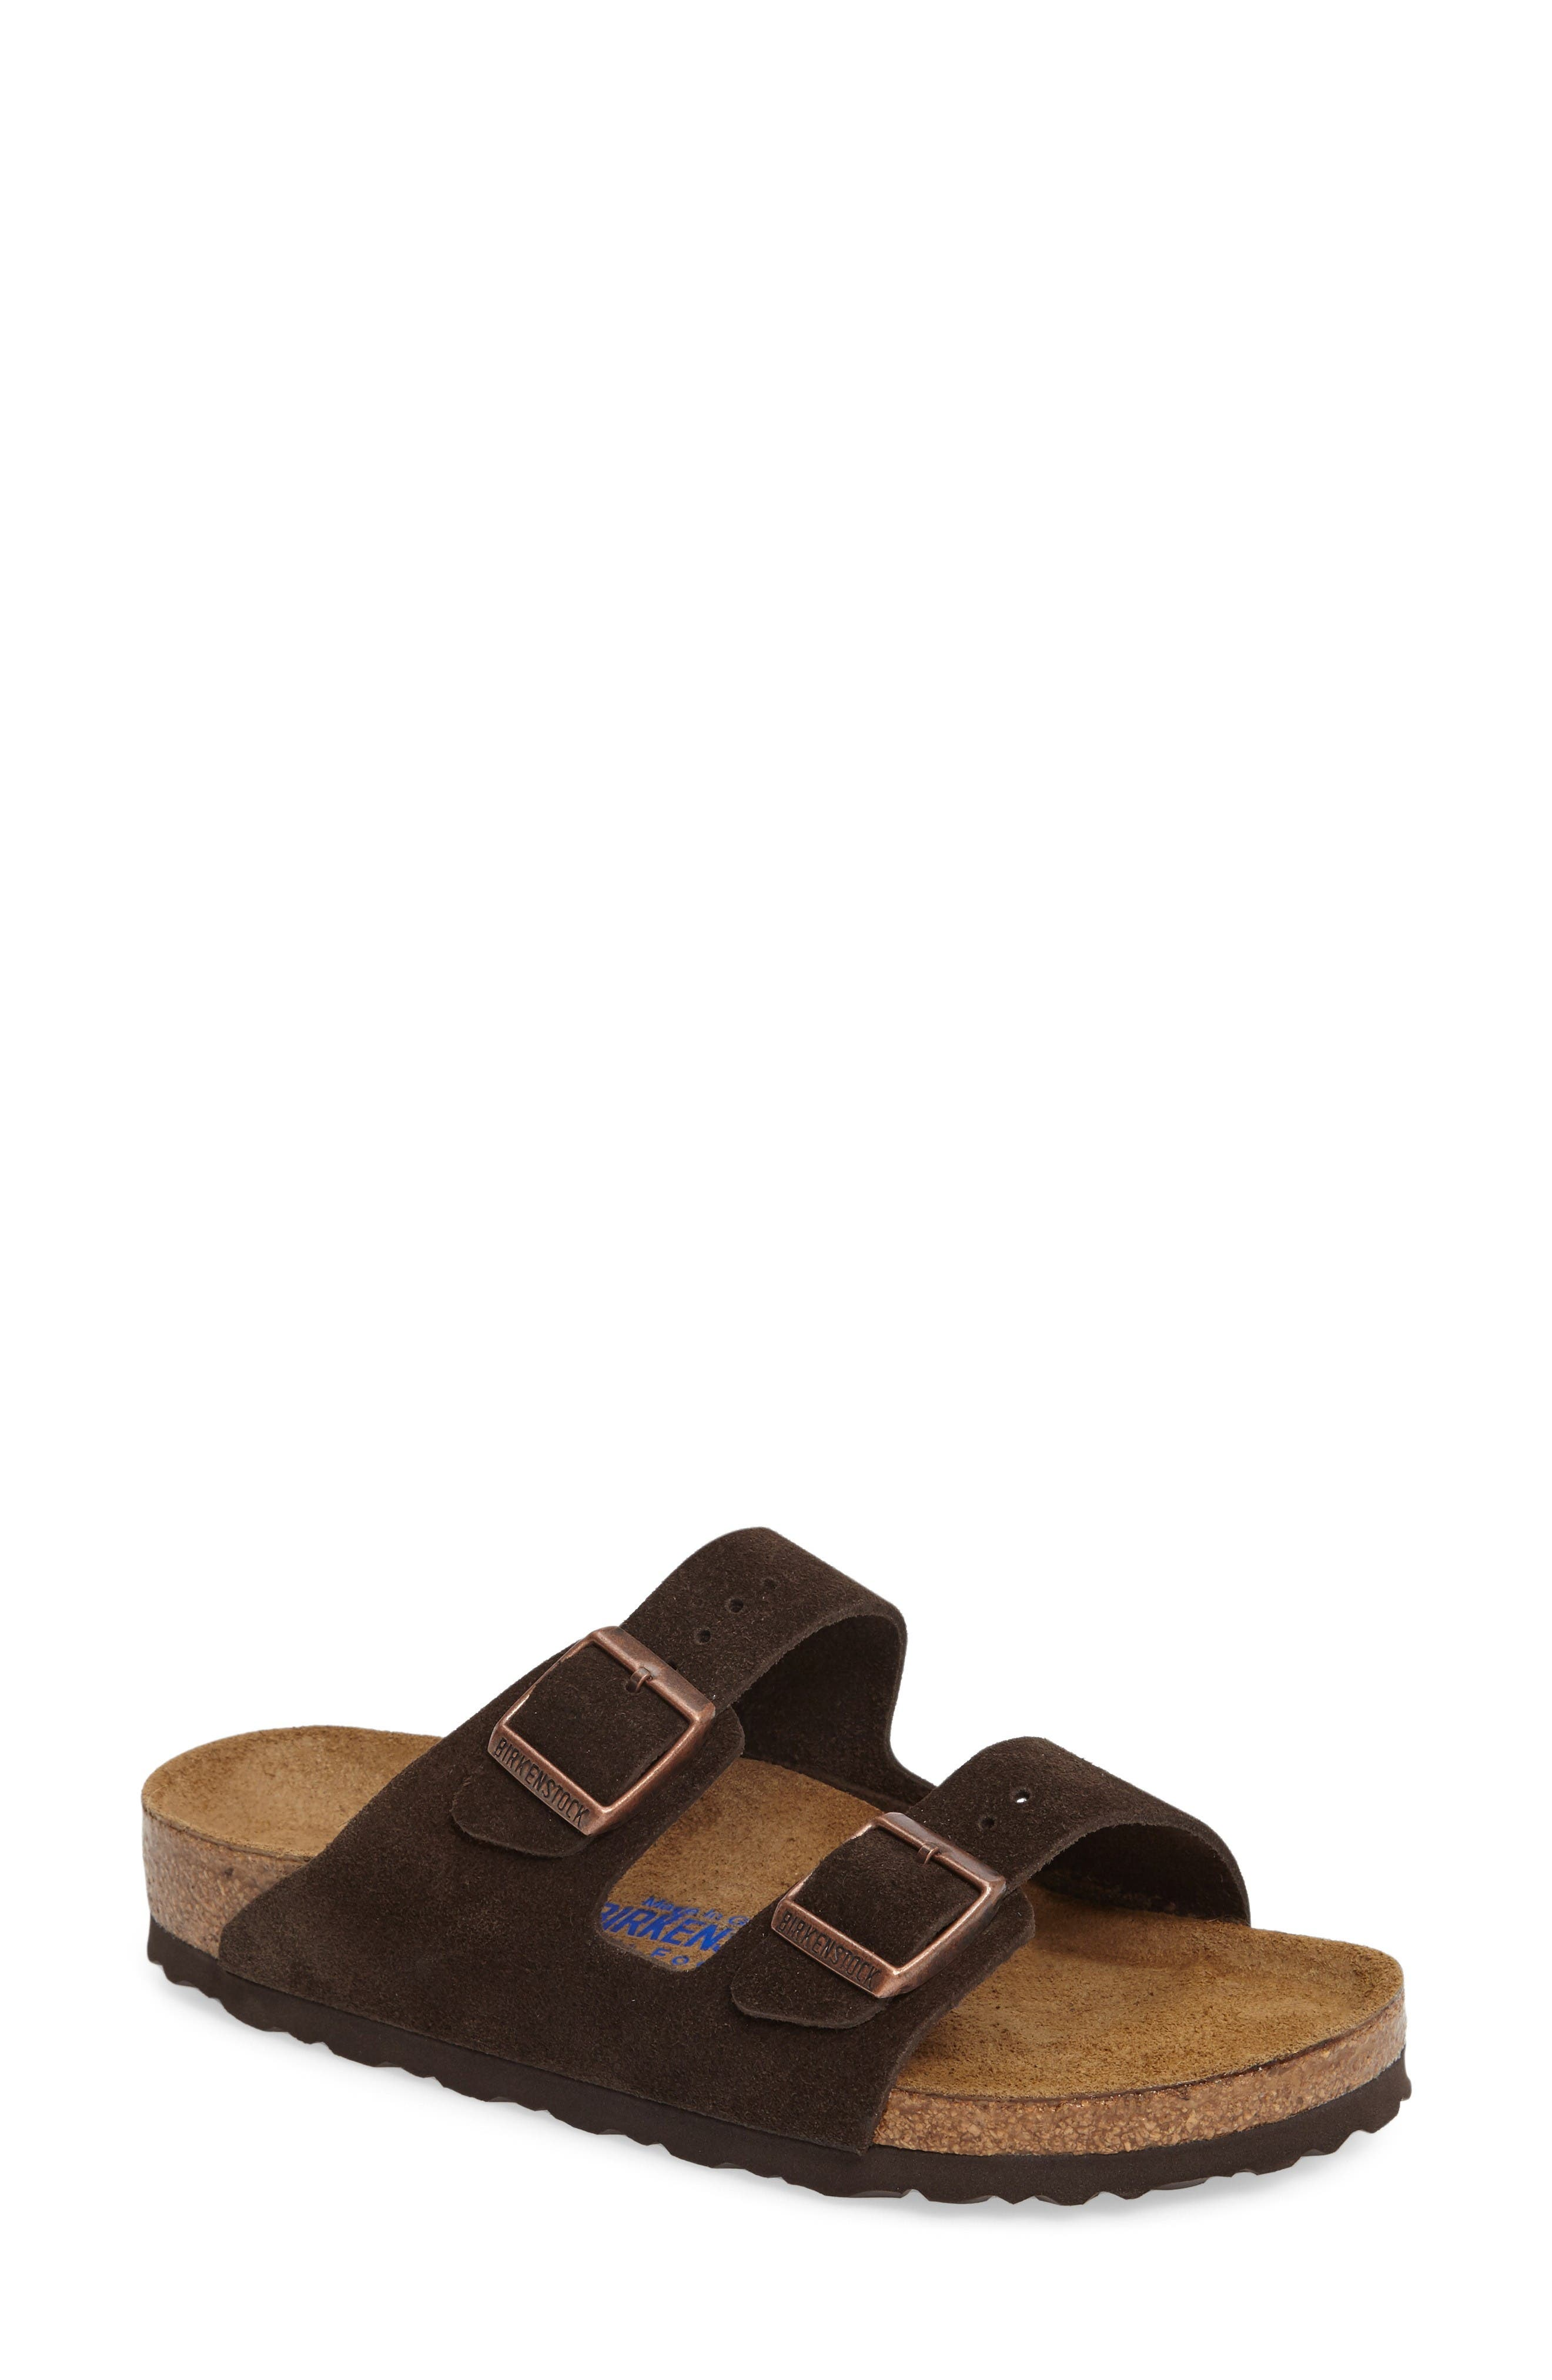 Main Image - Birkenstock 'Arizona' Soft Footbed Suede Sandal (Women)